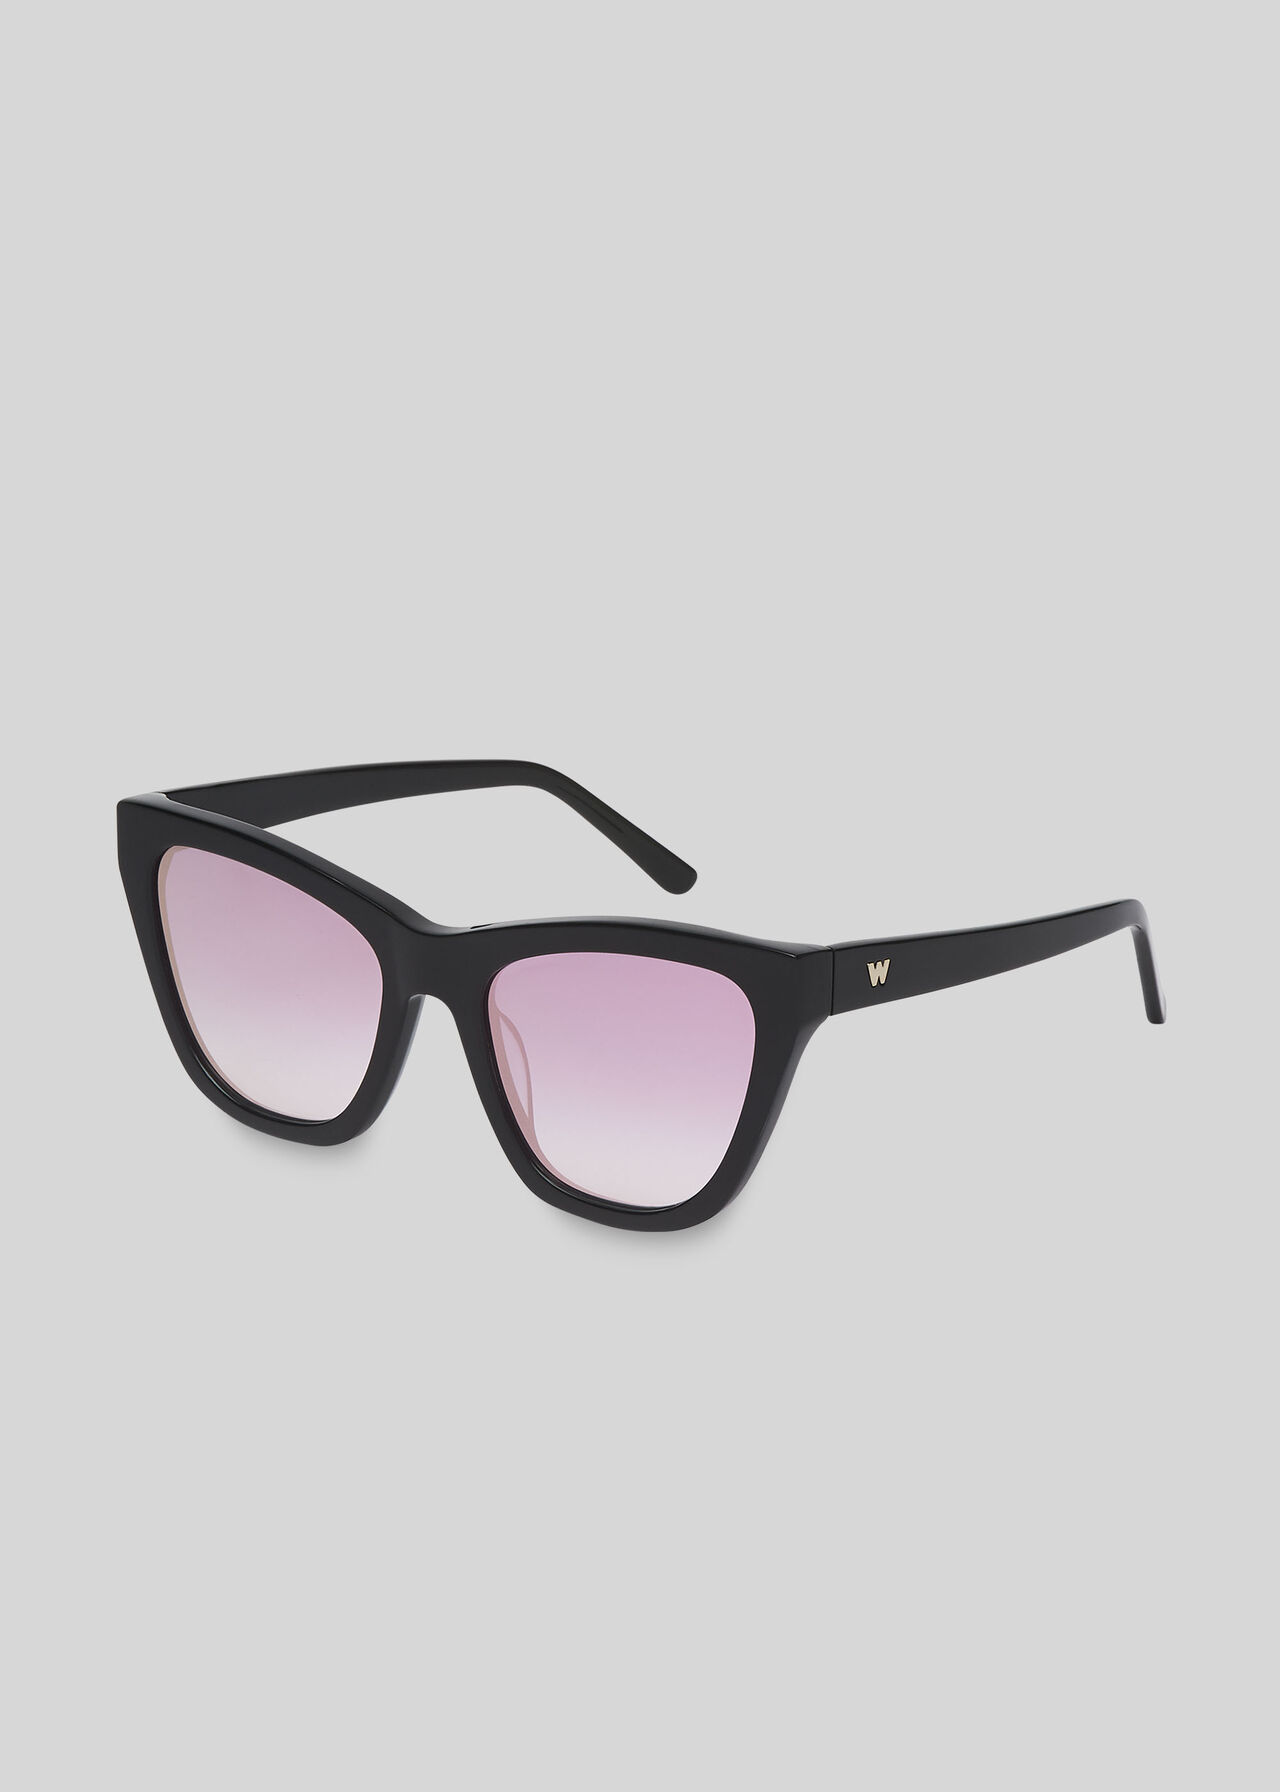 Asha Angular Sunglasses Black